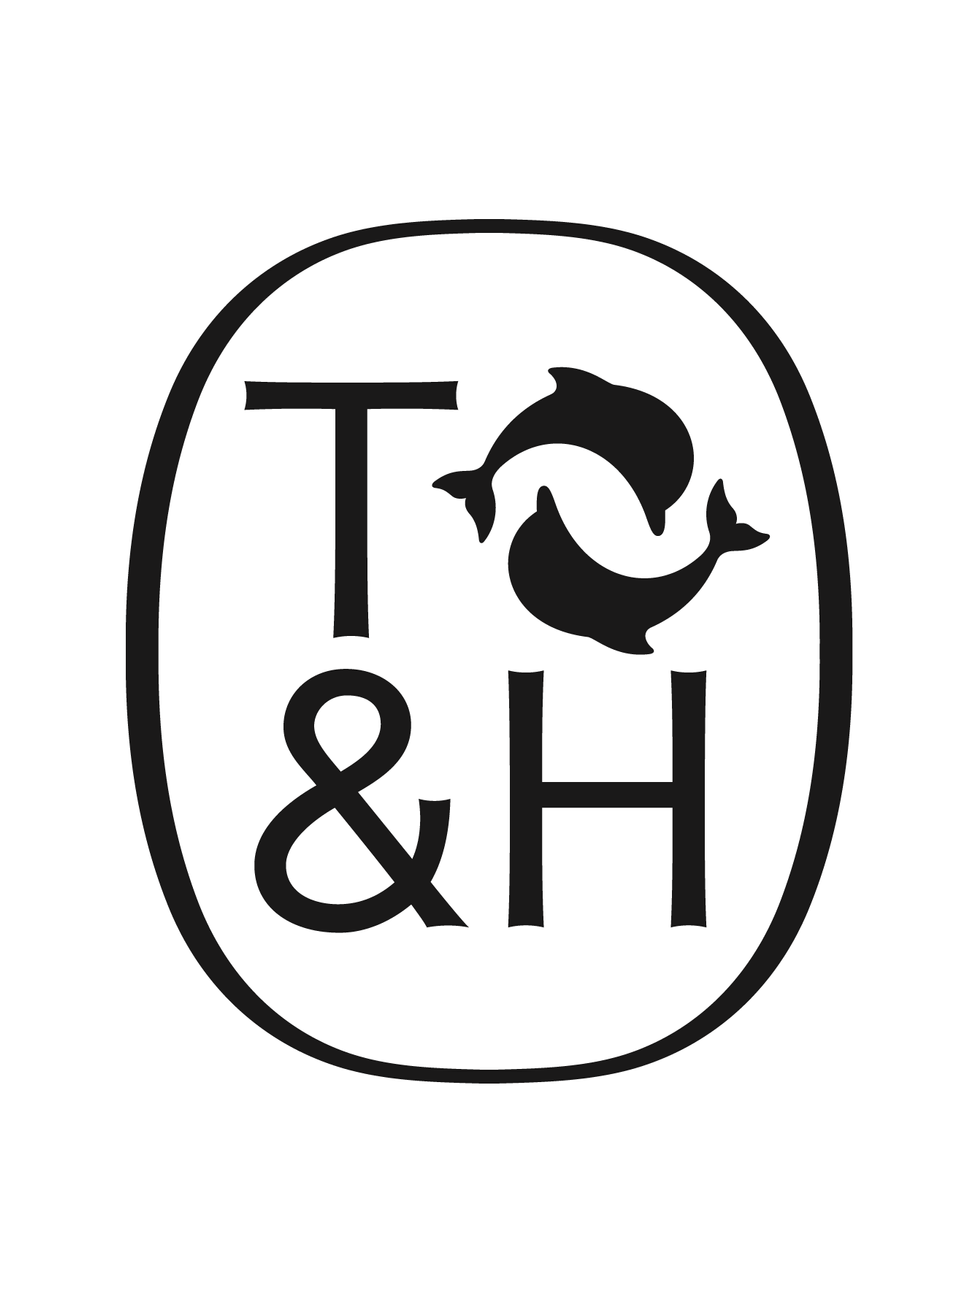 Turning pointe logo badge inspiration